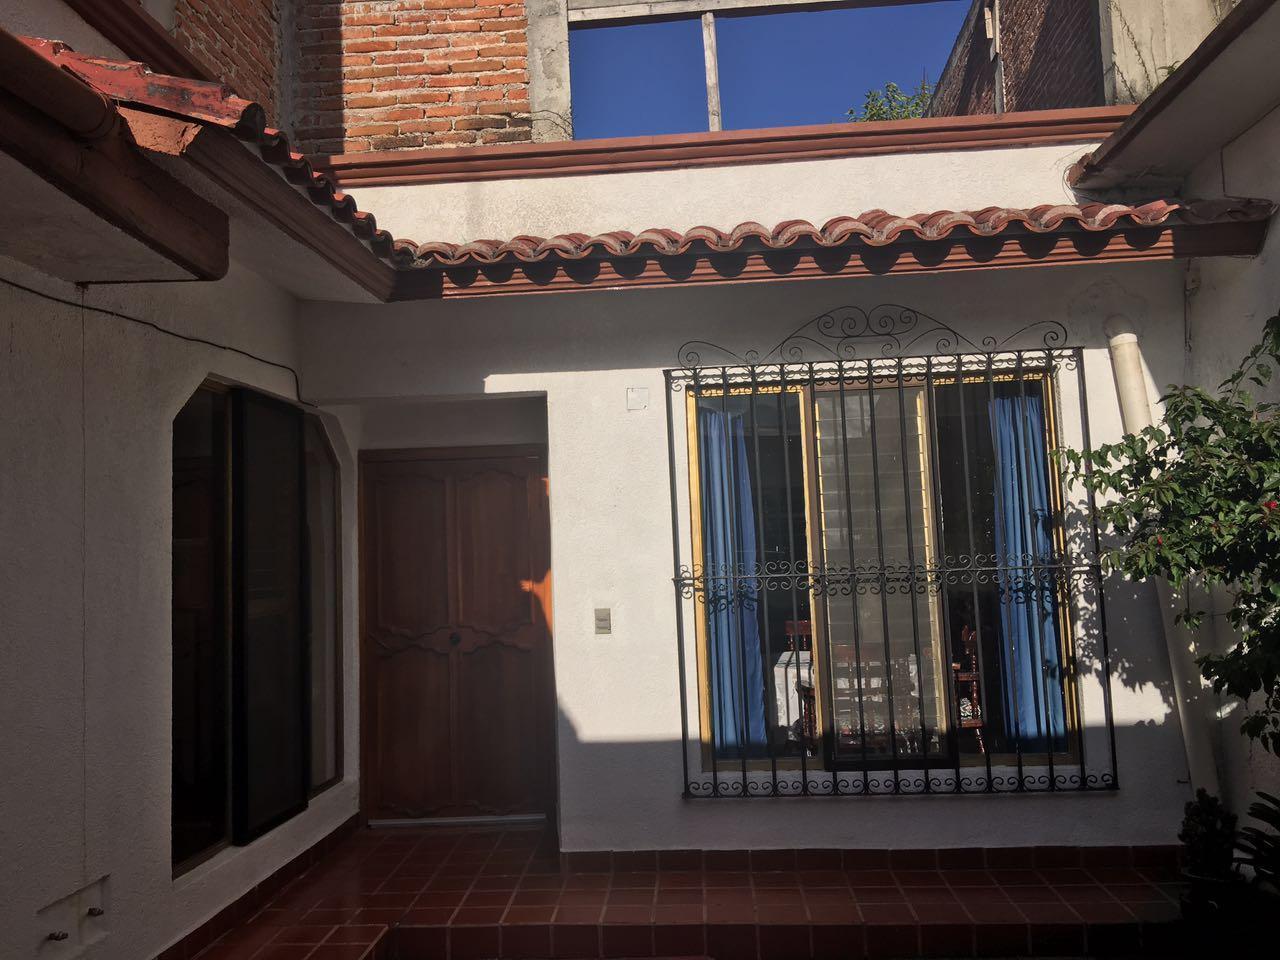 Departamento en Renta en Infonavit La Isla, San Cristóbal De Las Casas